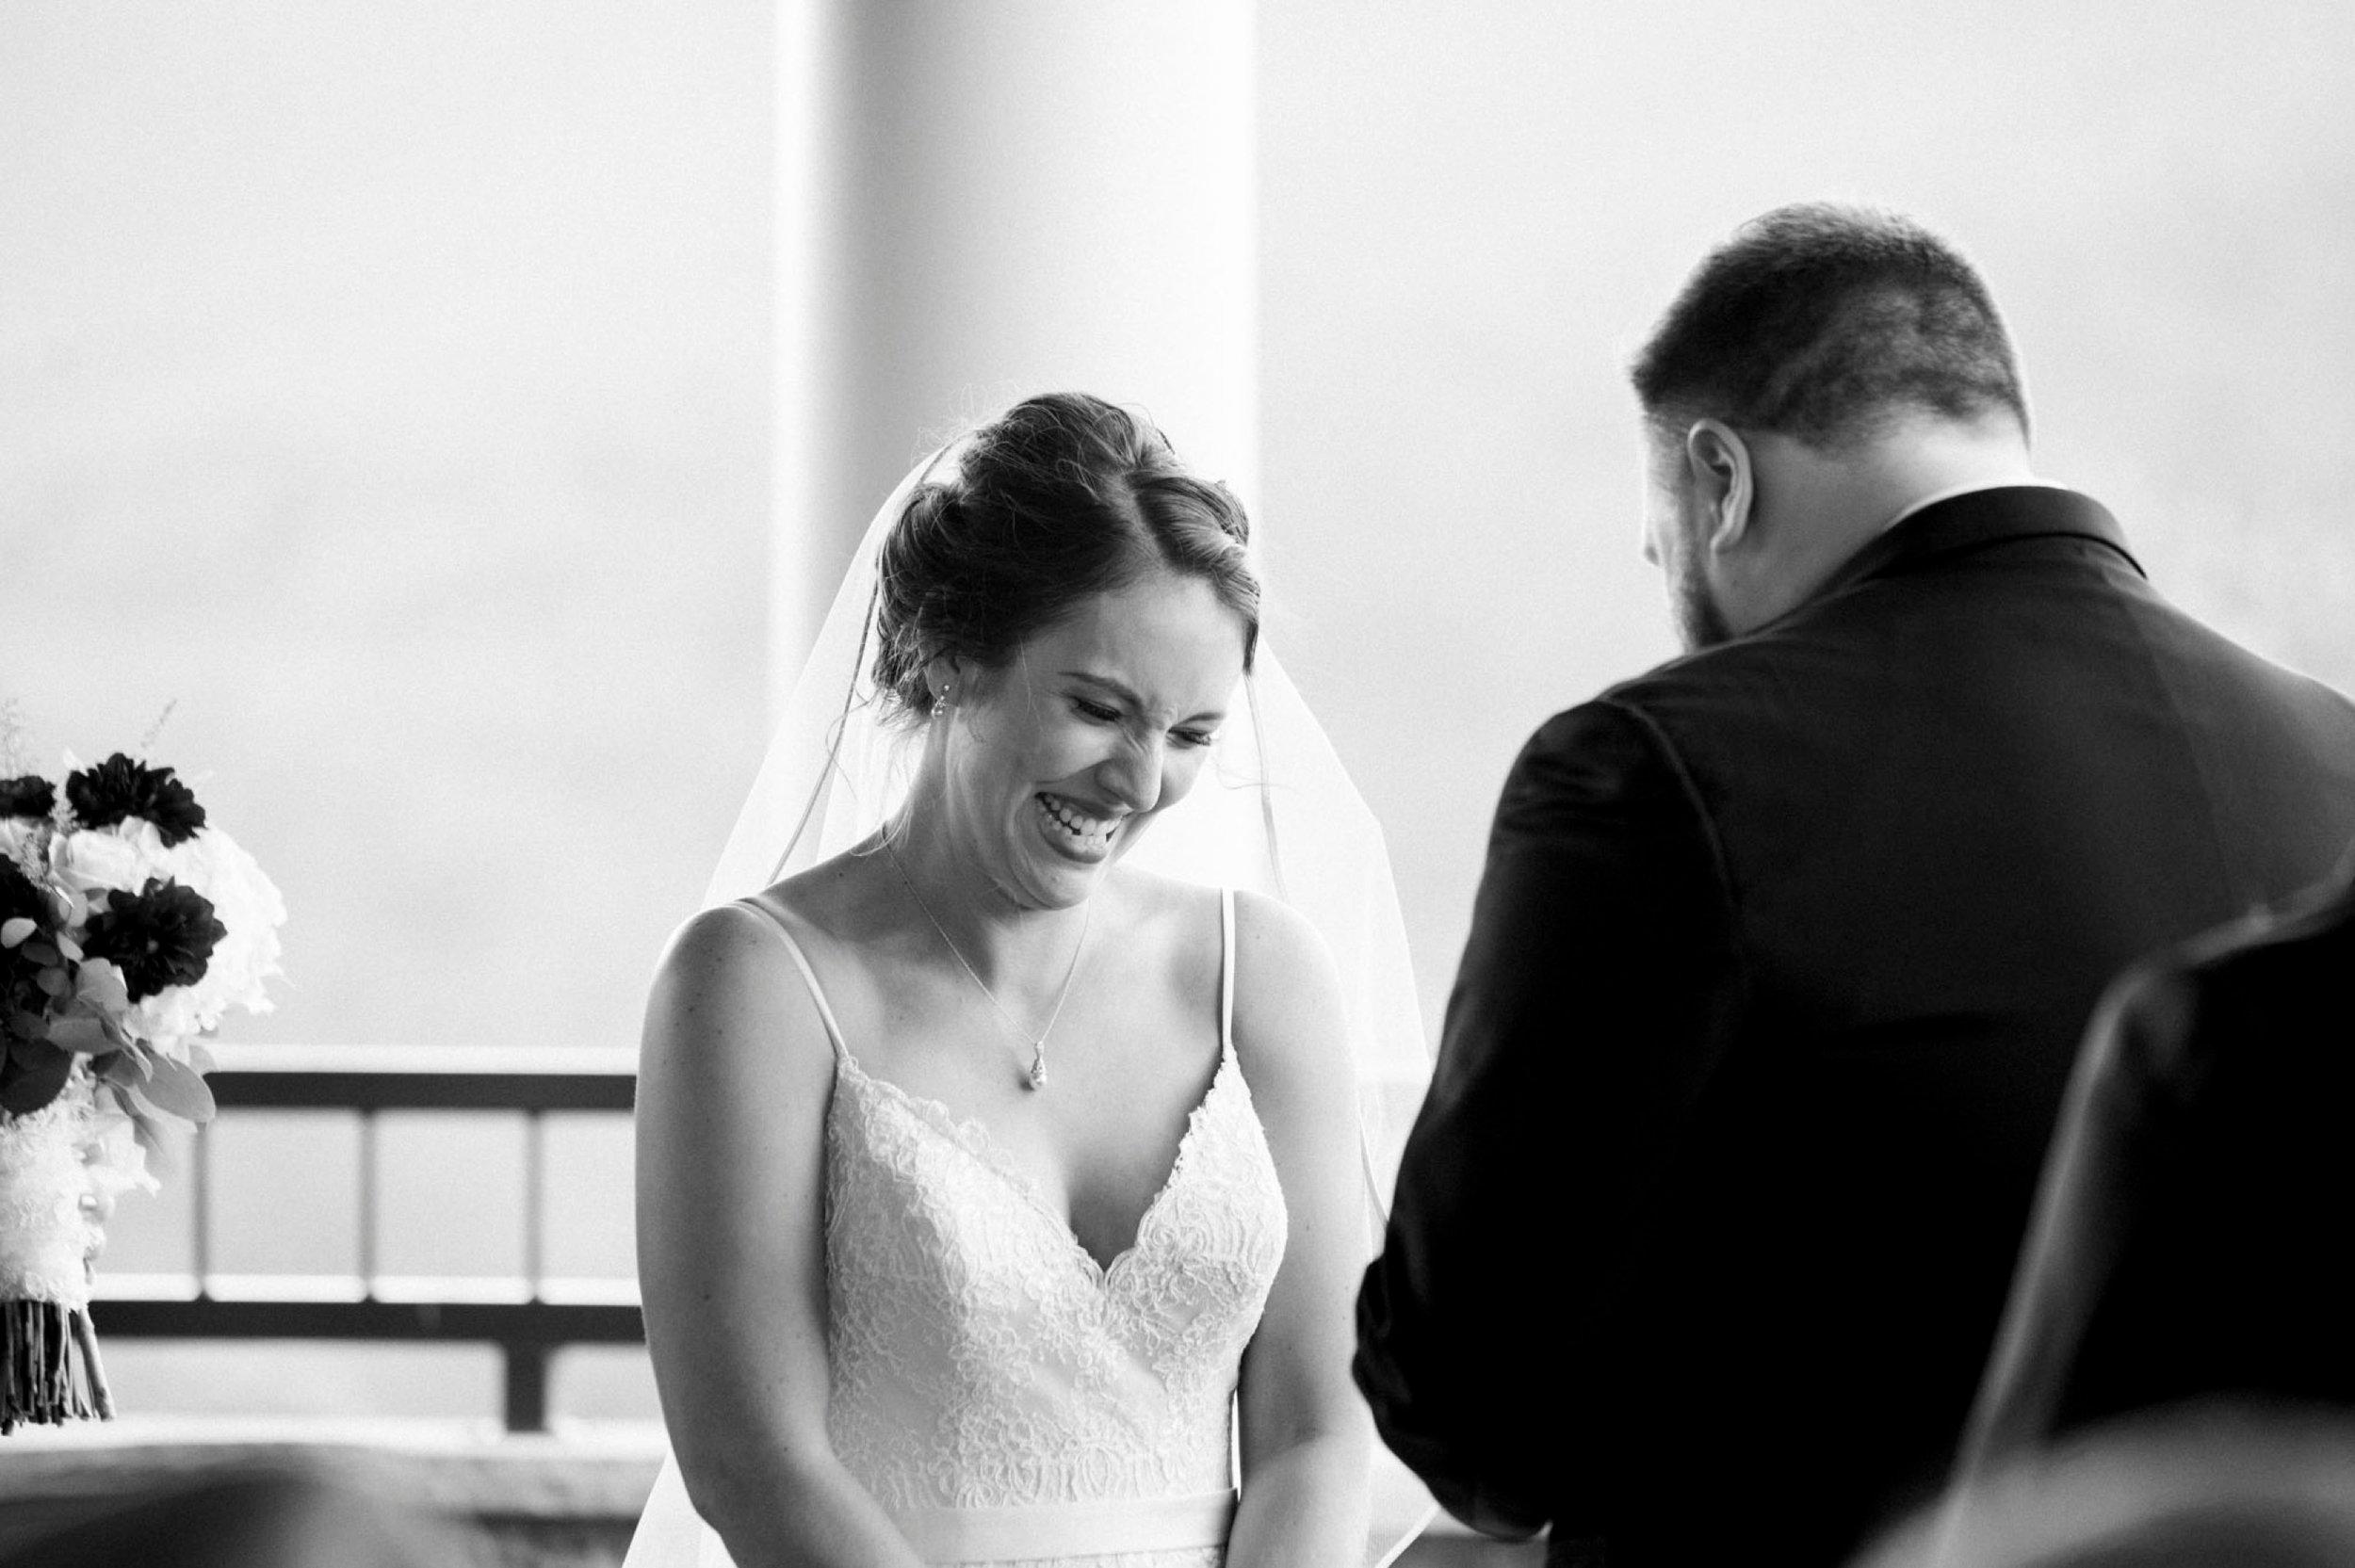 IrvineEstate_LexingtonVA_Wedding_FallWedding_VirginiaWeddingPhotographer 64.jpg